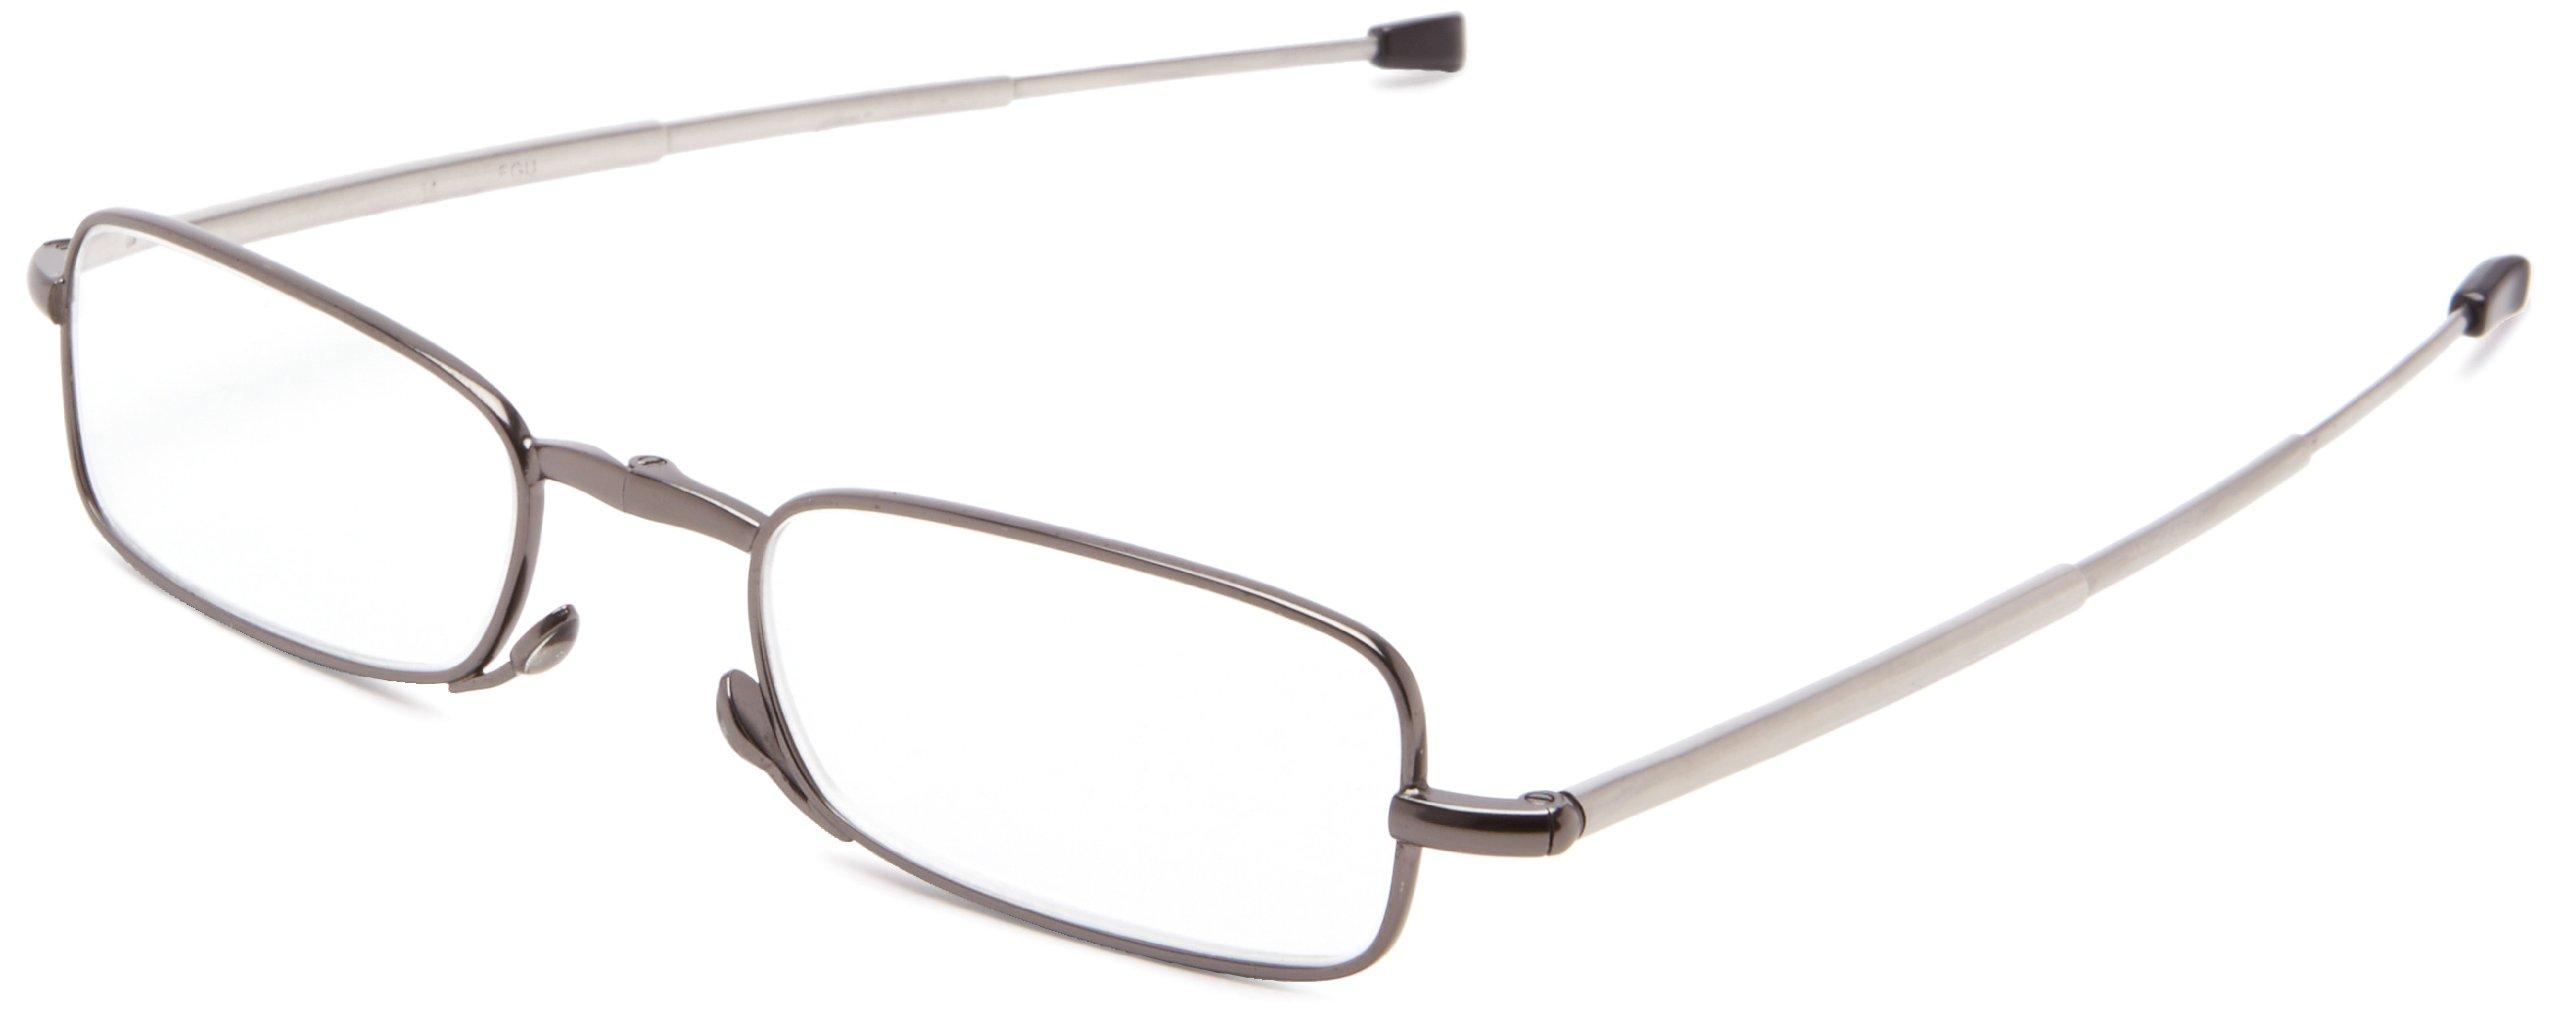 Foster Grant Folding Reading Glasses Amazon